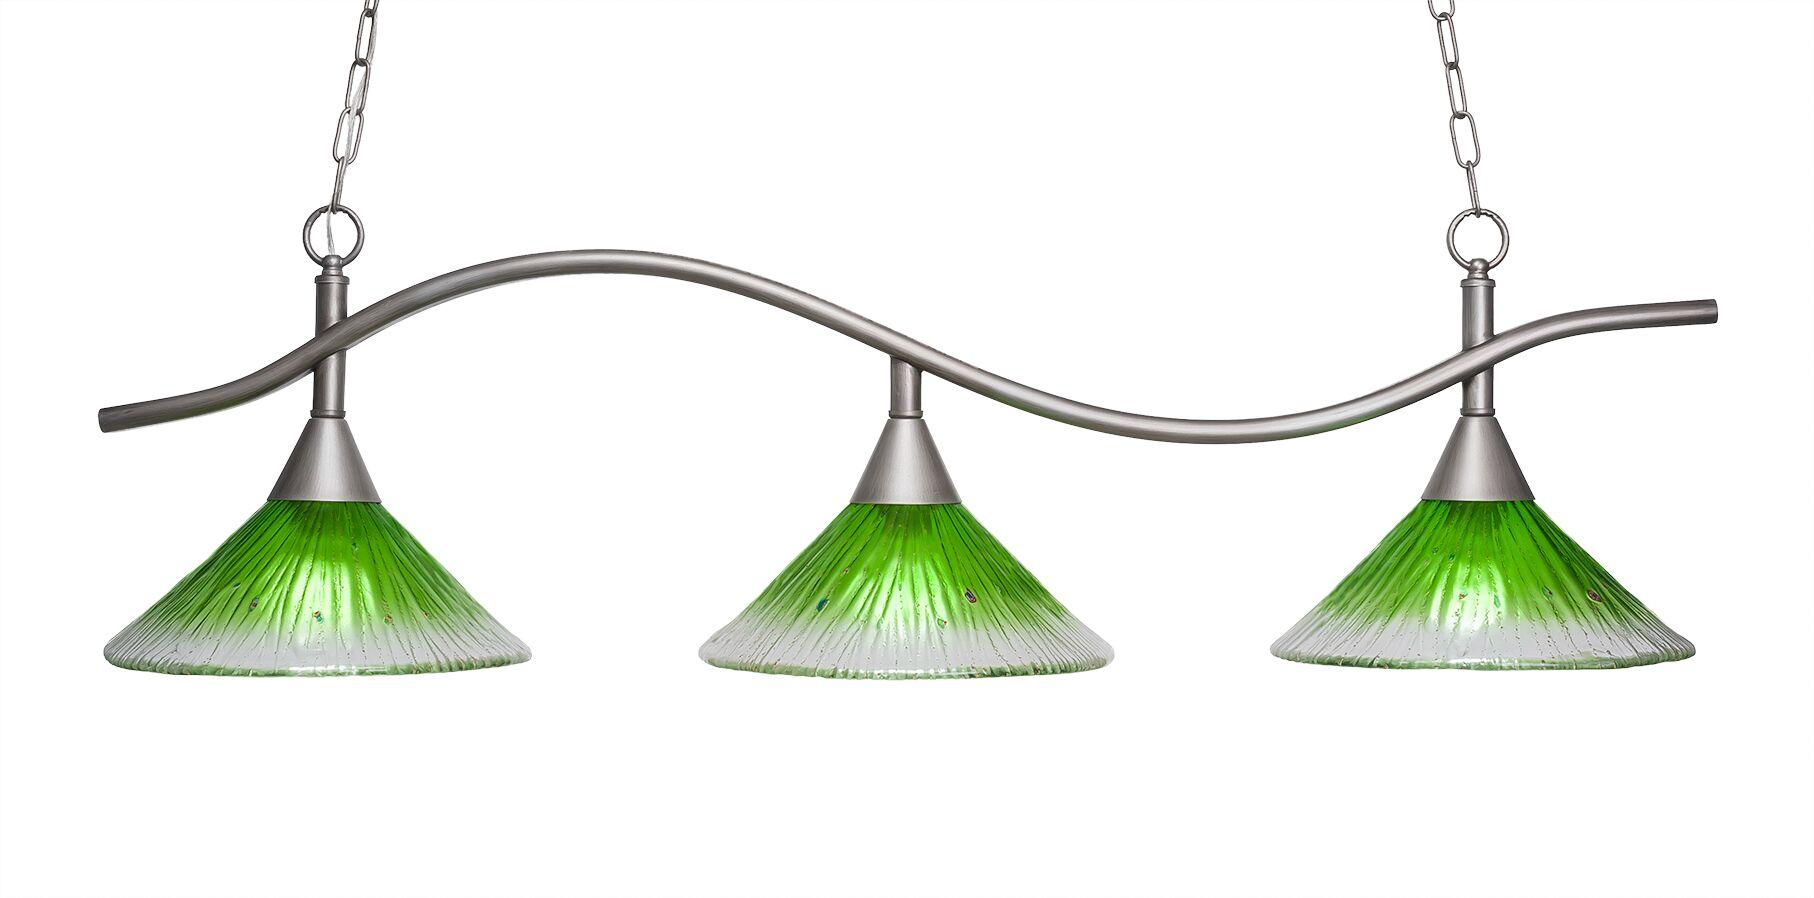 Demi 3-Light Kitchen Island Pendant Shade Color: Kiwi Green